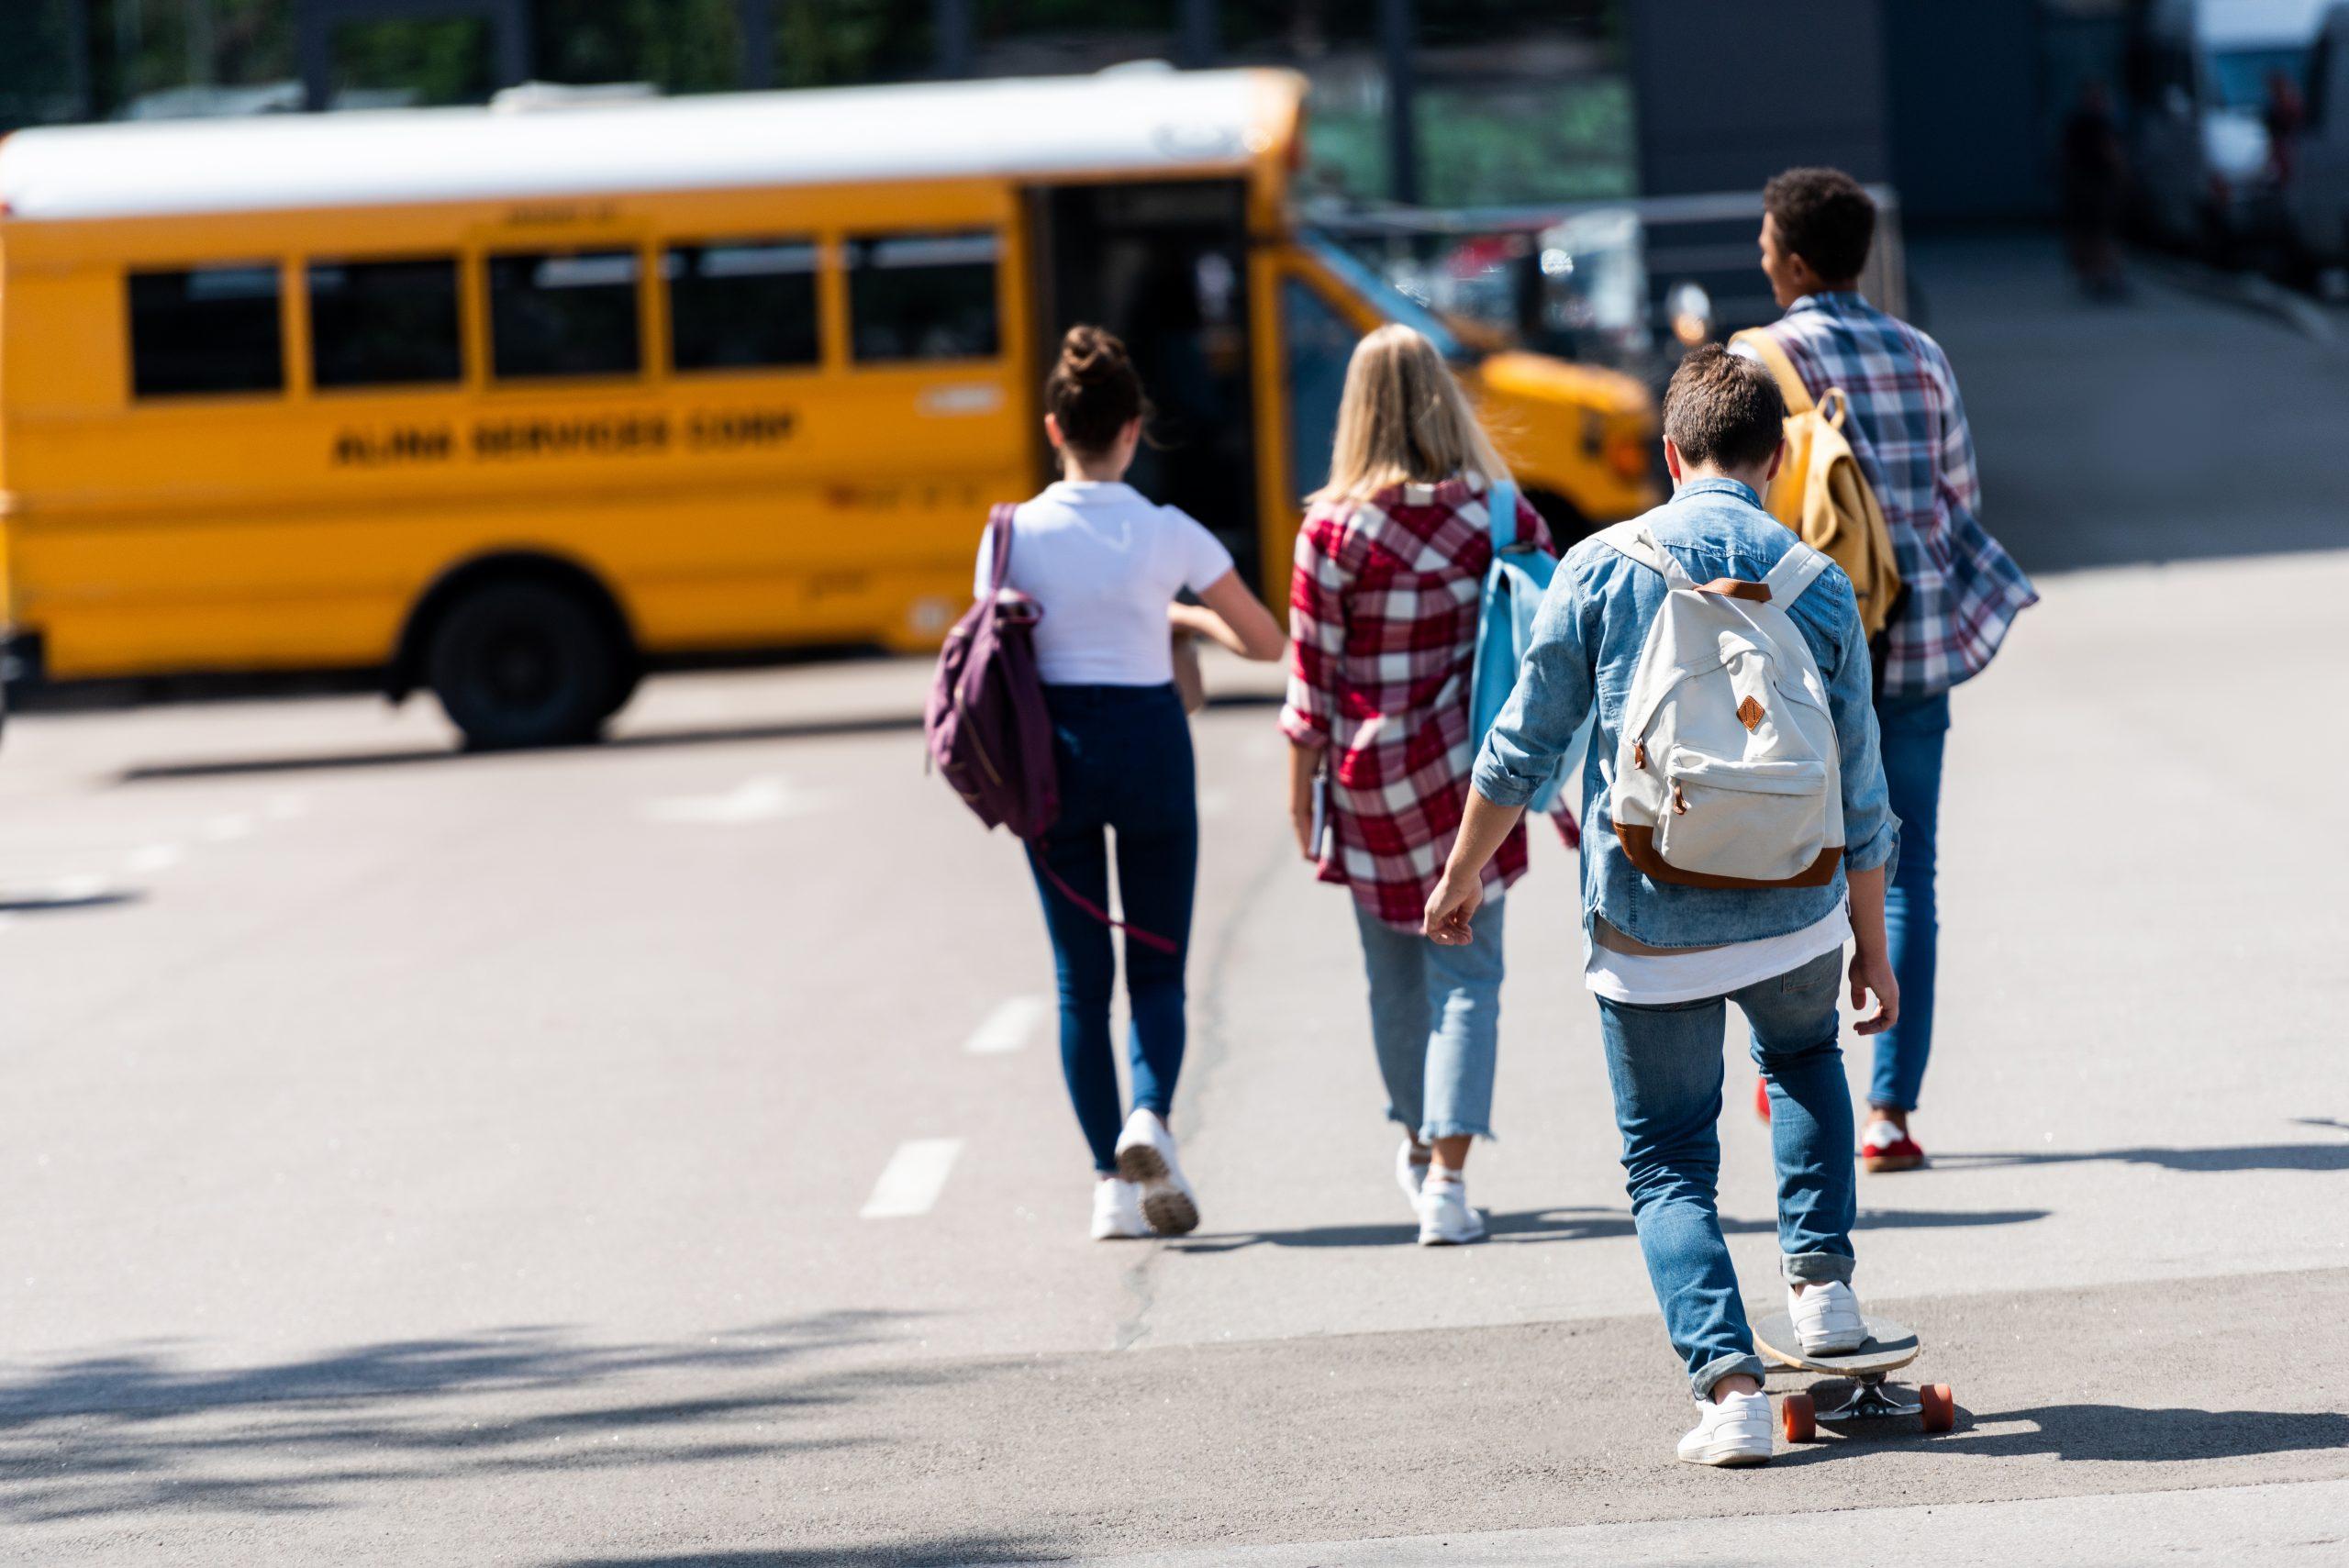 kids going on school bus